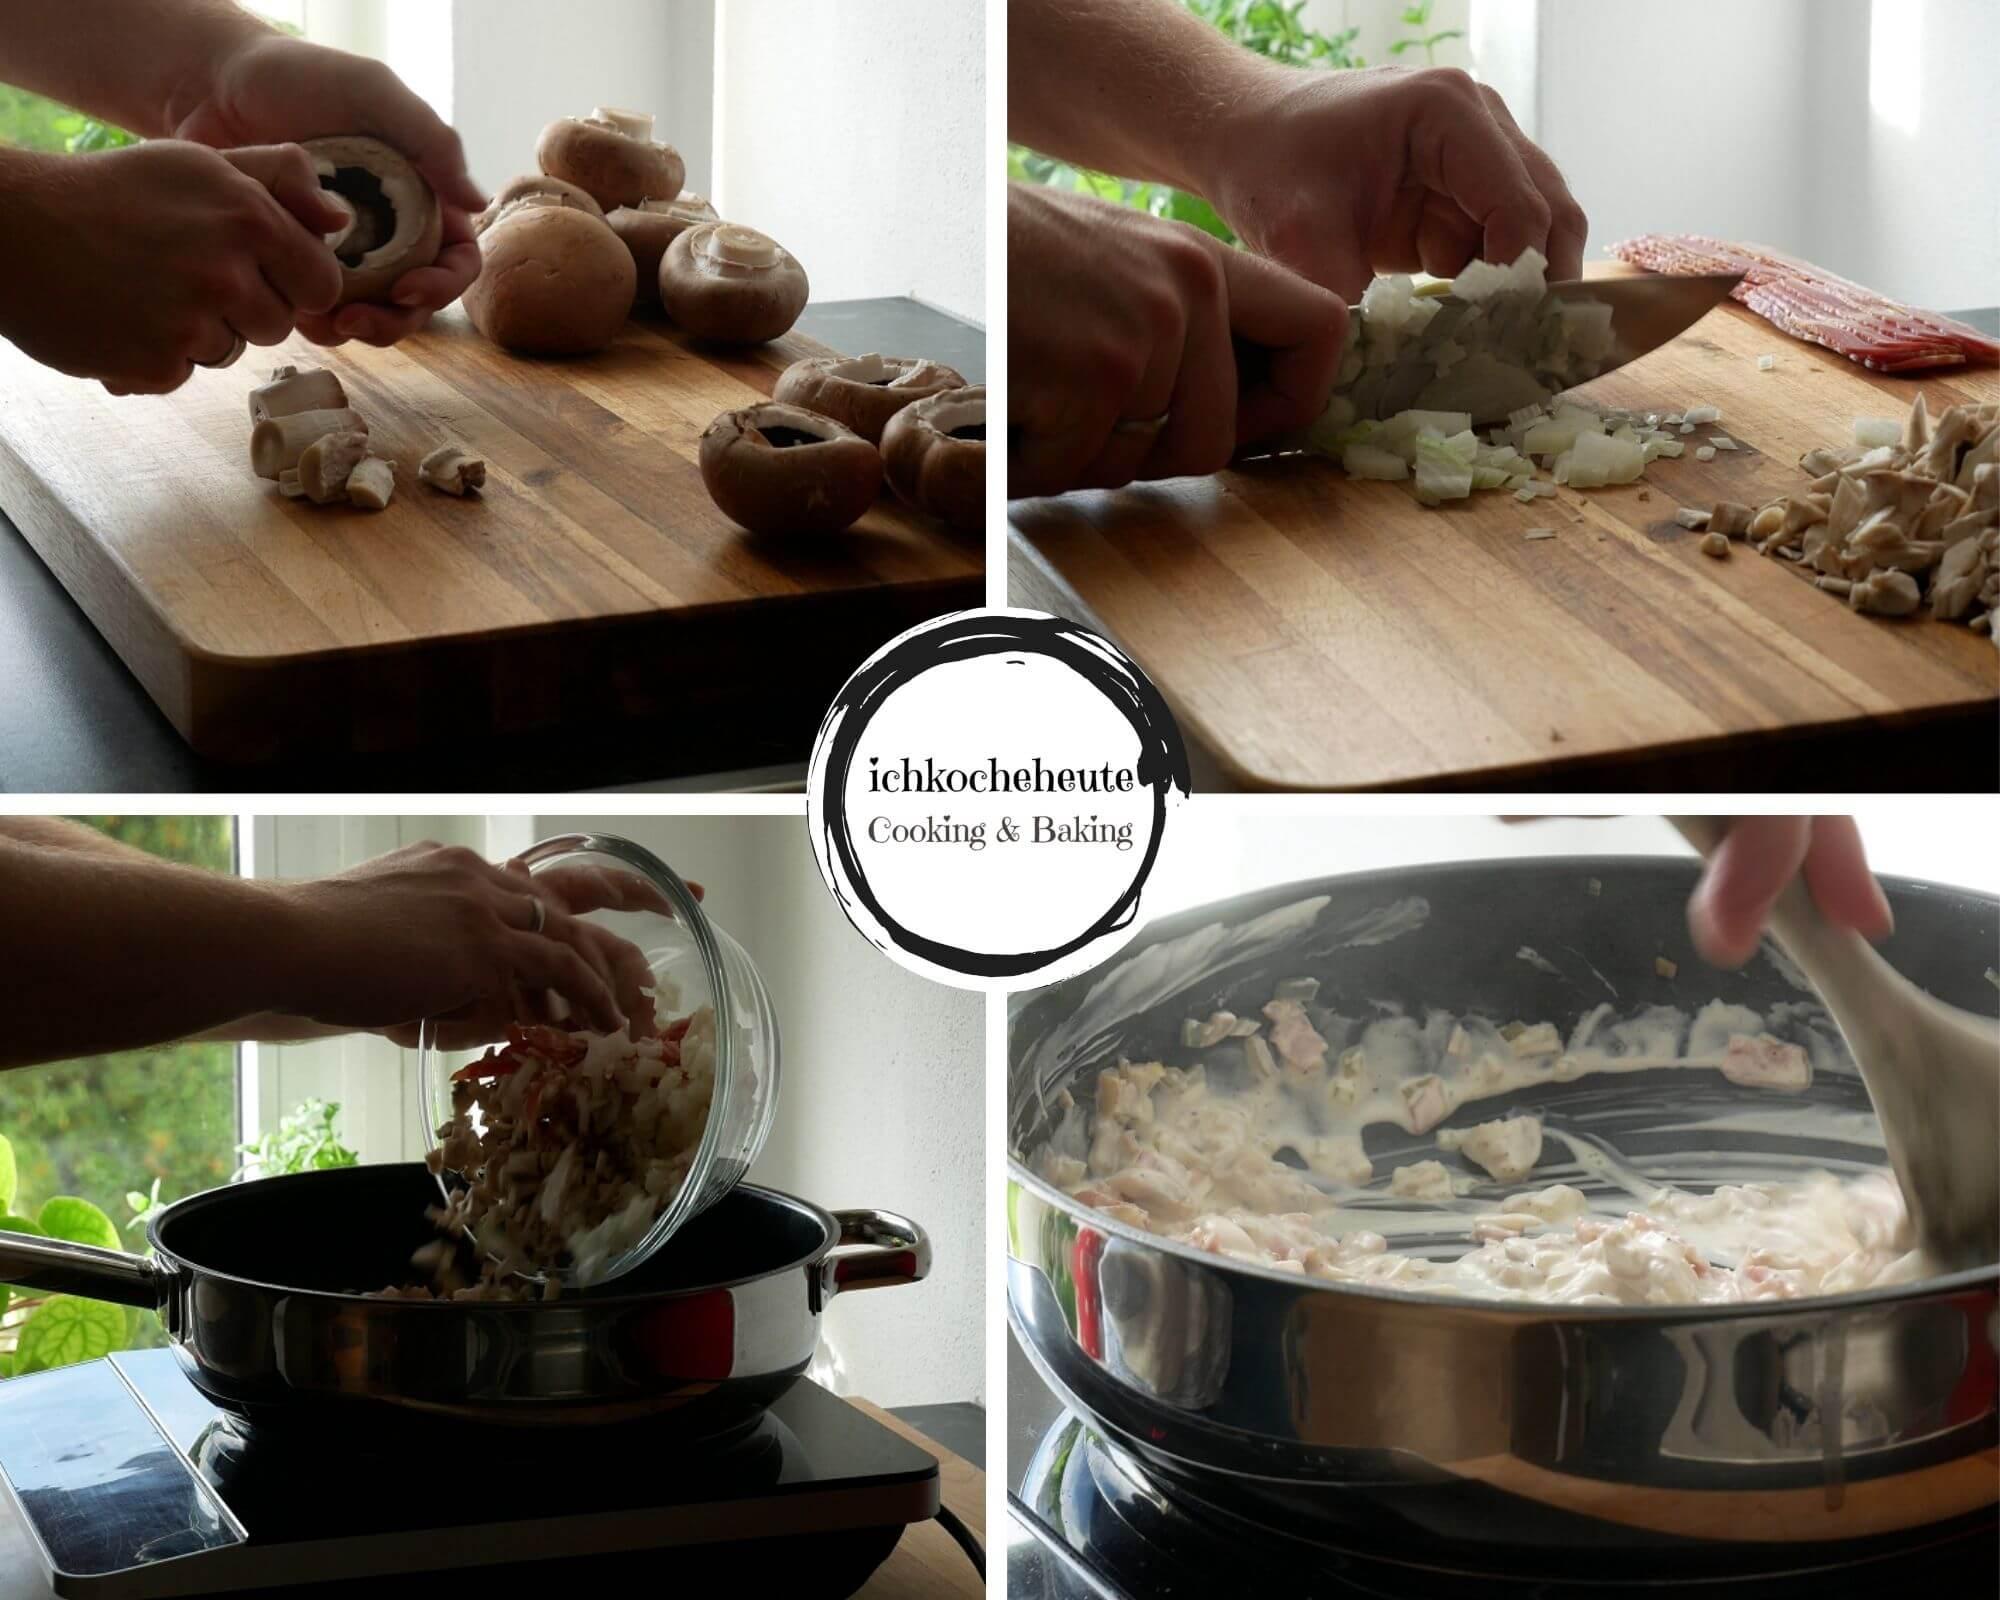 Preparations for Mushroom Stuffing